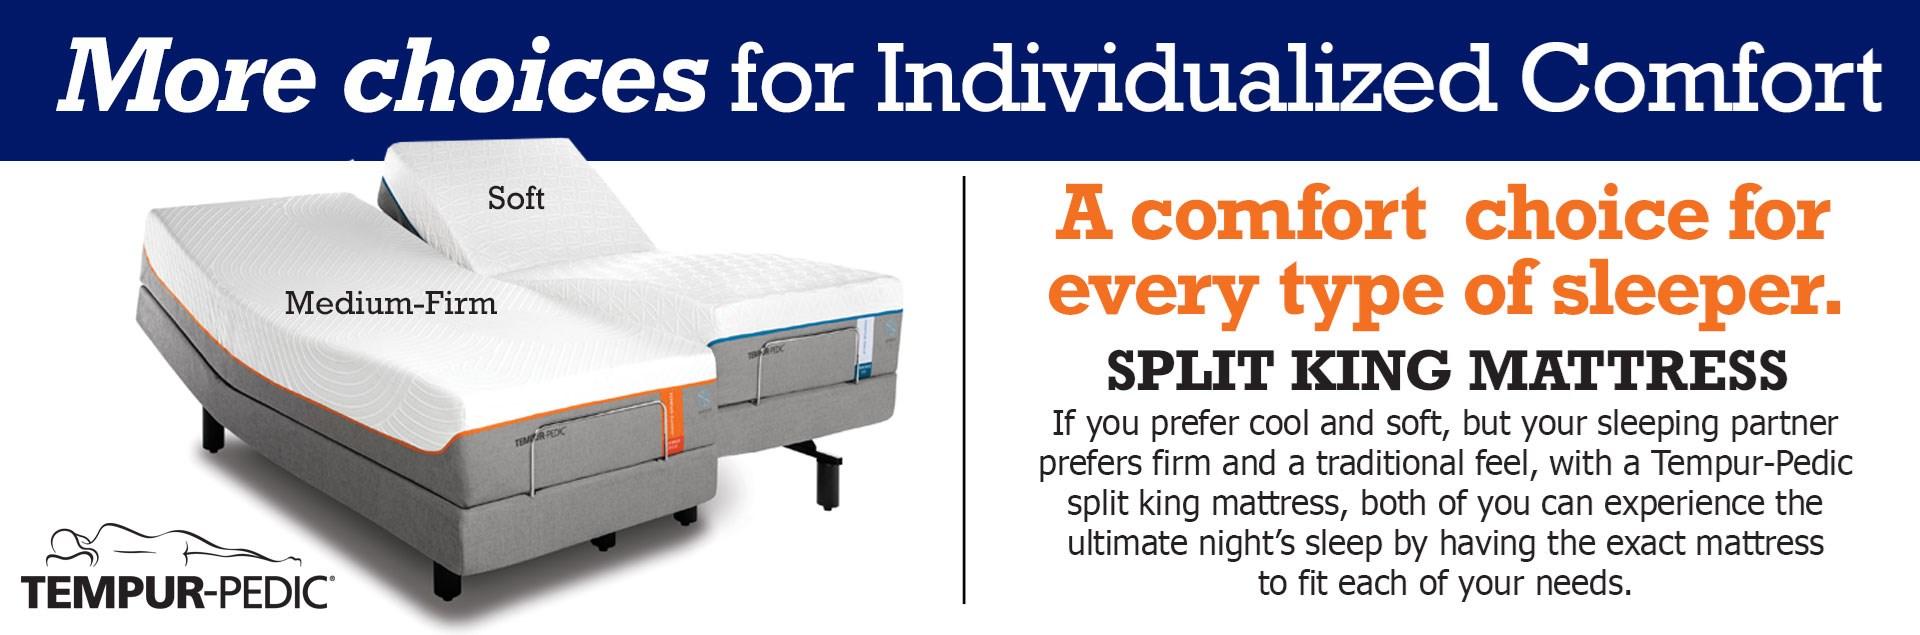 Individualized Comfort